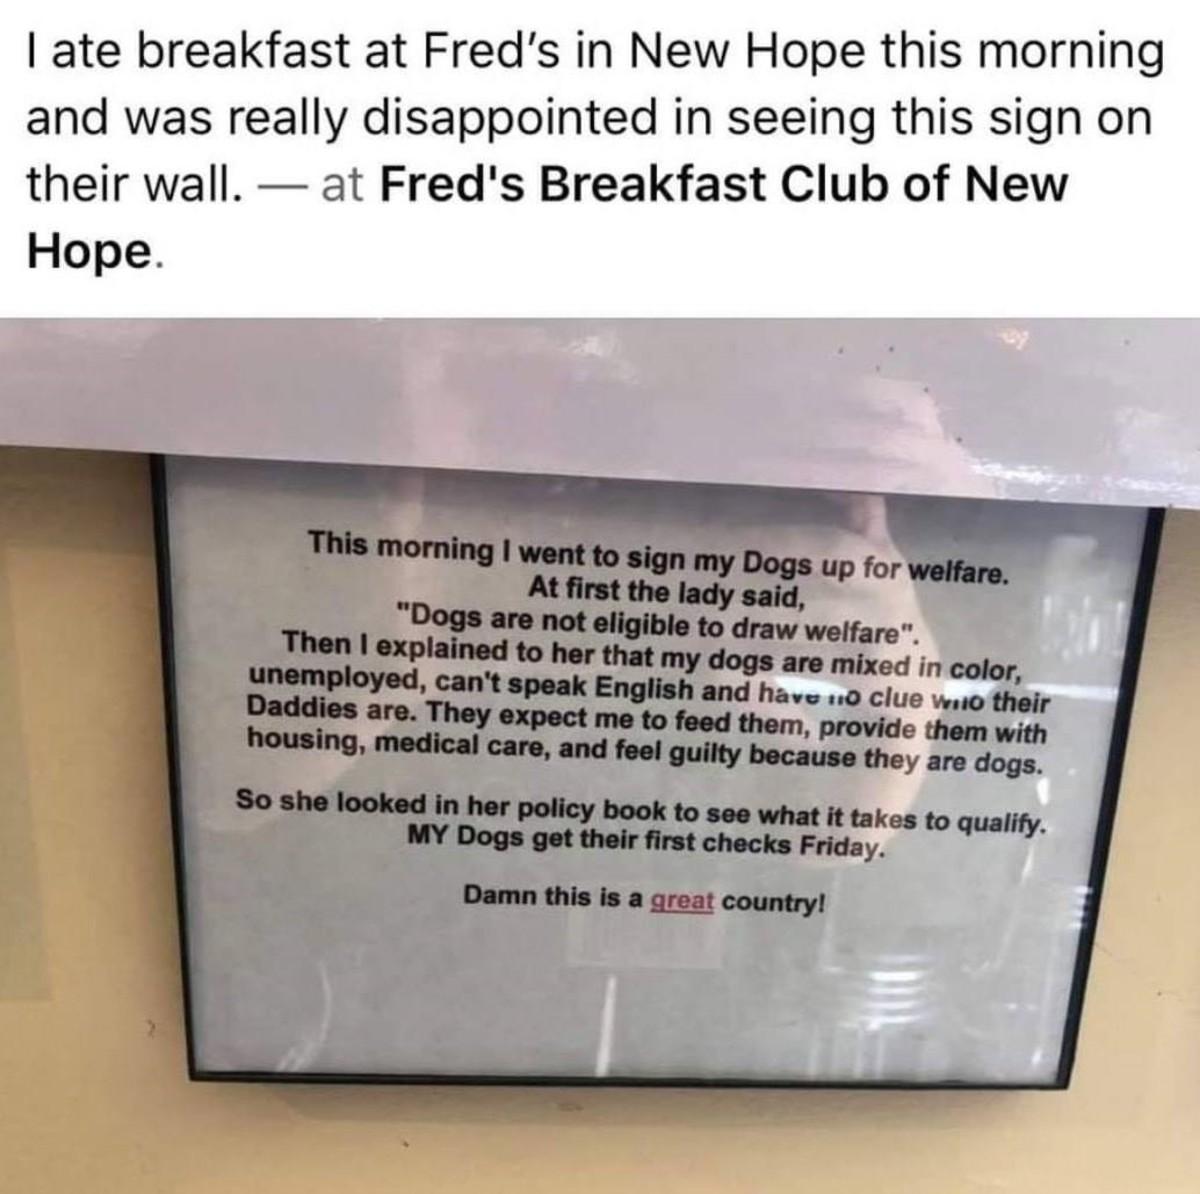 Photo Credit: Facebook/Bucks County NAACP